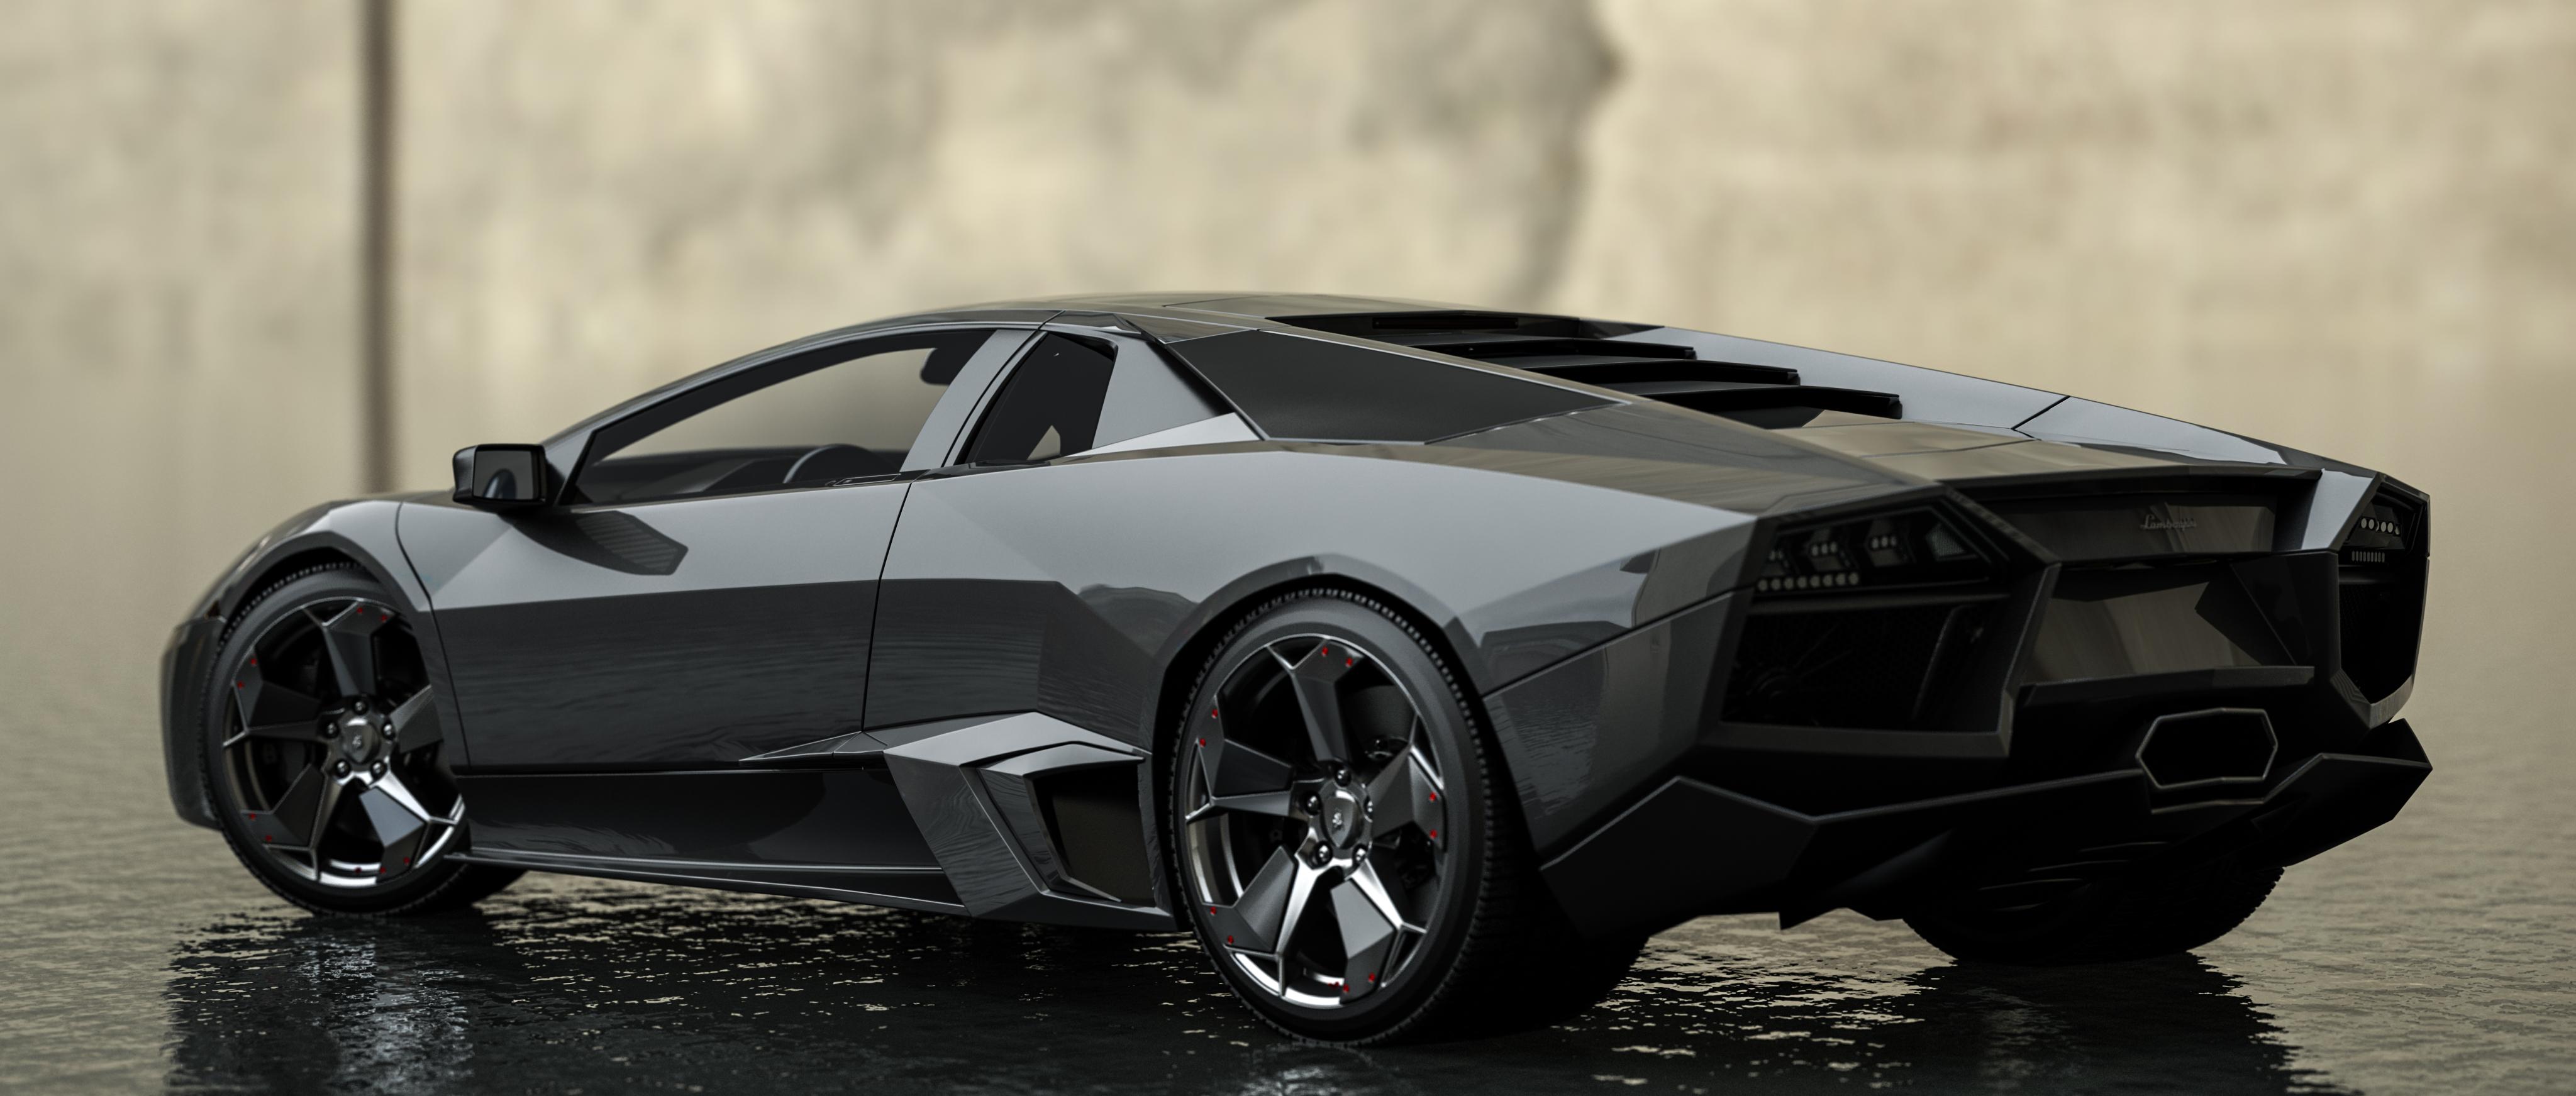 Lamborghini Reventon By Ajaxial On Deviantart